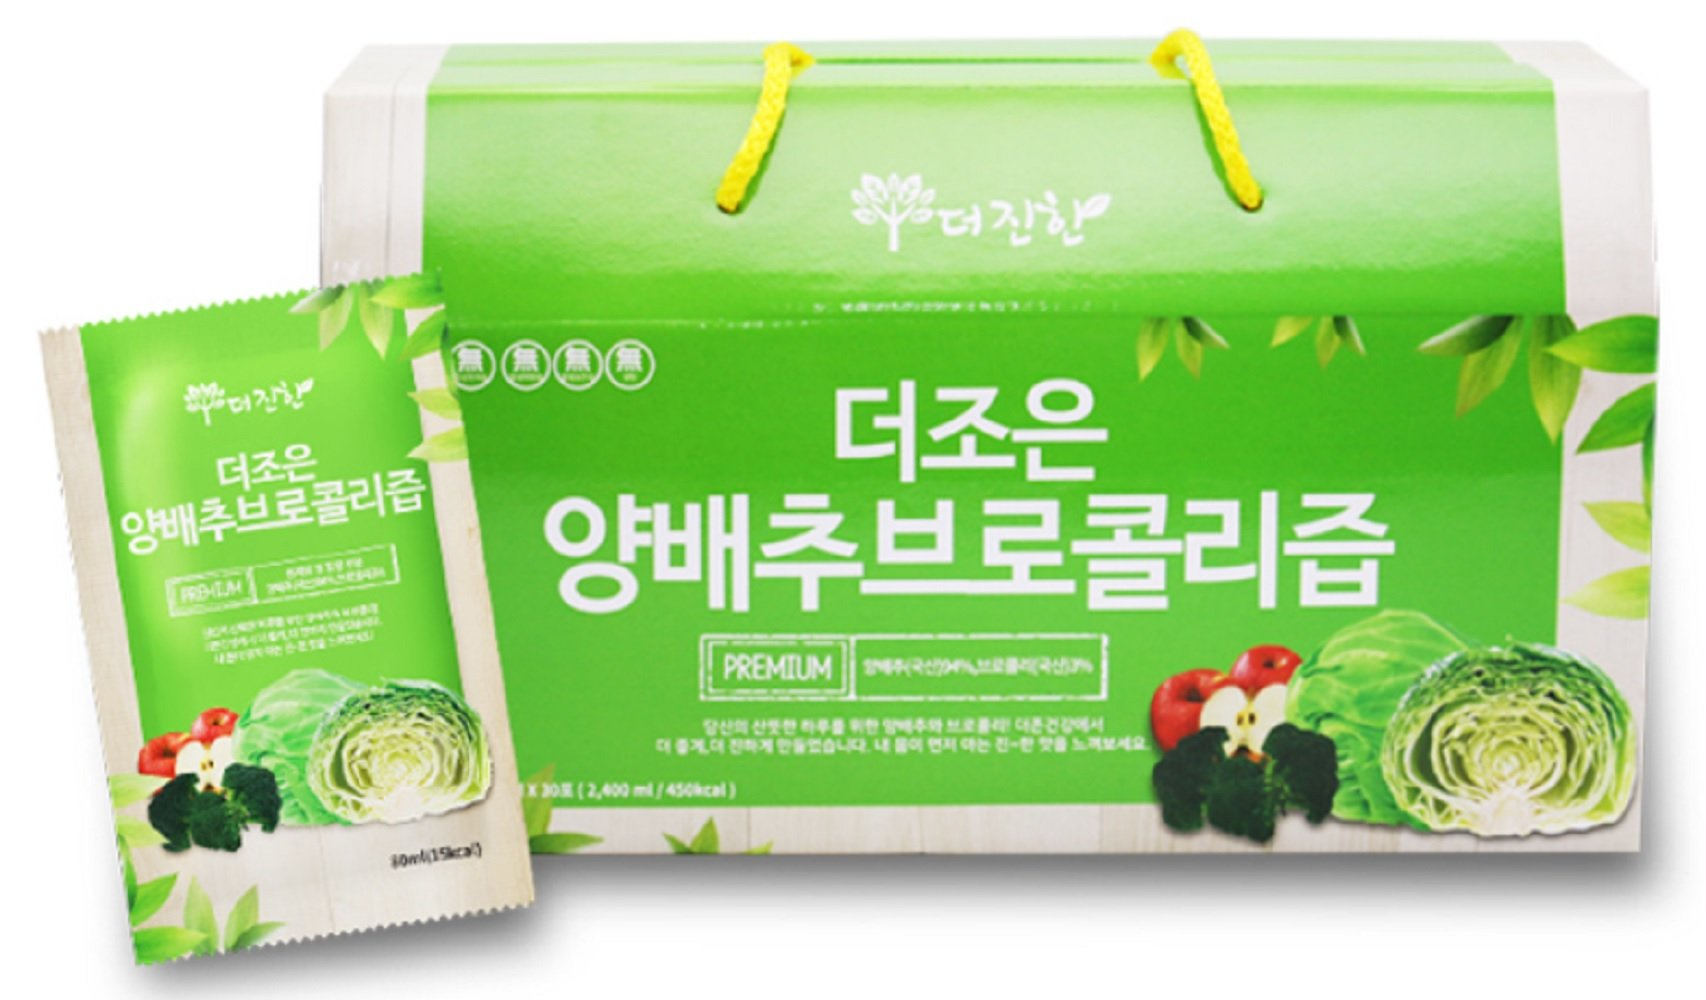 Premium Cabbage Juice with Broccoli /15 Kcal Health Food (Origin South Korea) (Dietary Fiber, Beta Carotene, Minerals, Lysine, Calcium, Potassium) (1 Box 80ml X 30 Packs)